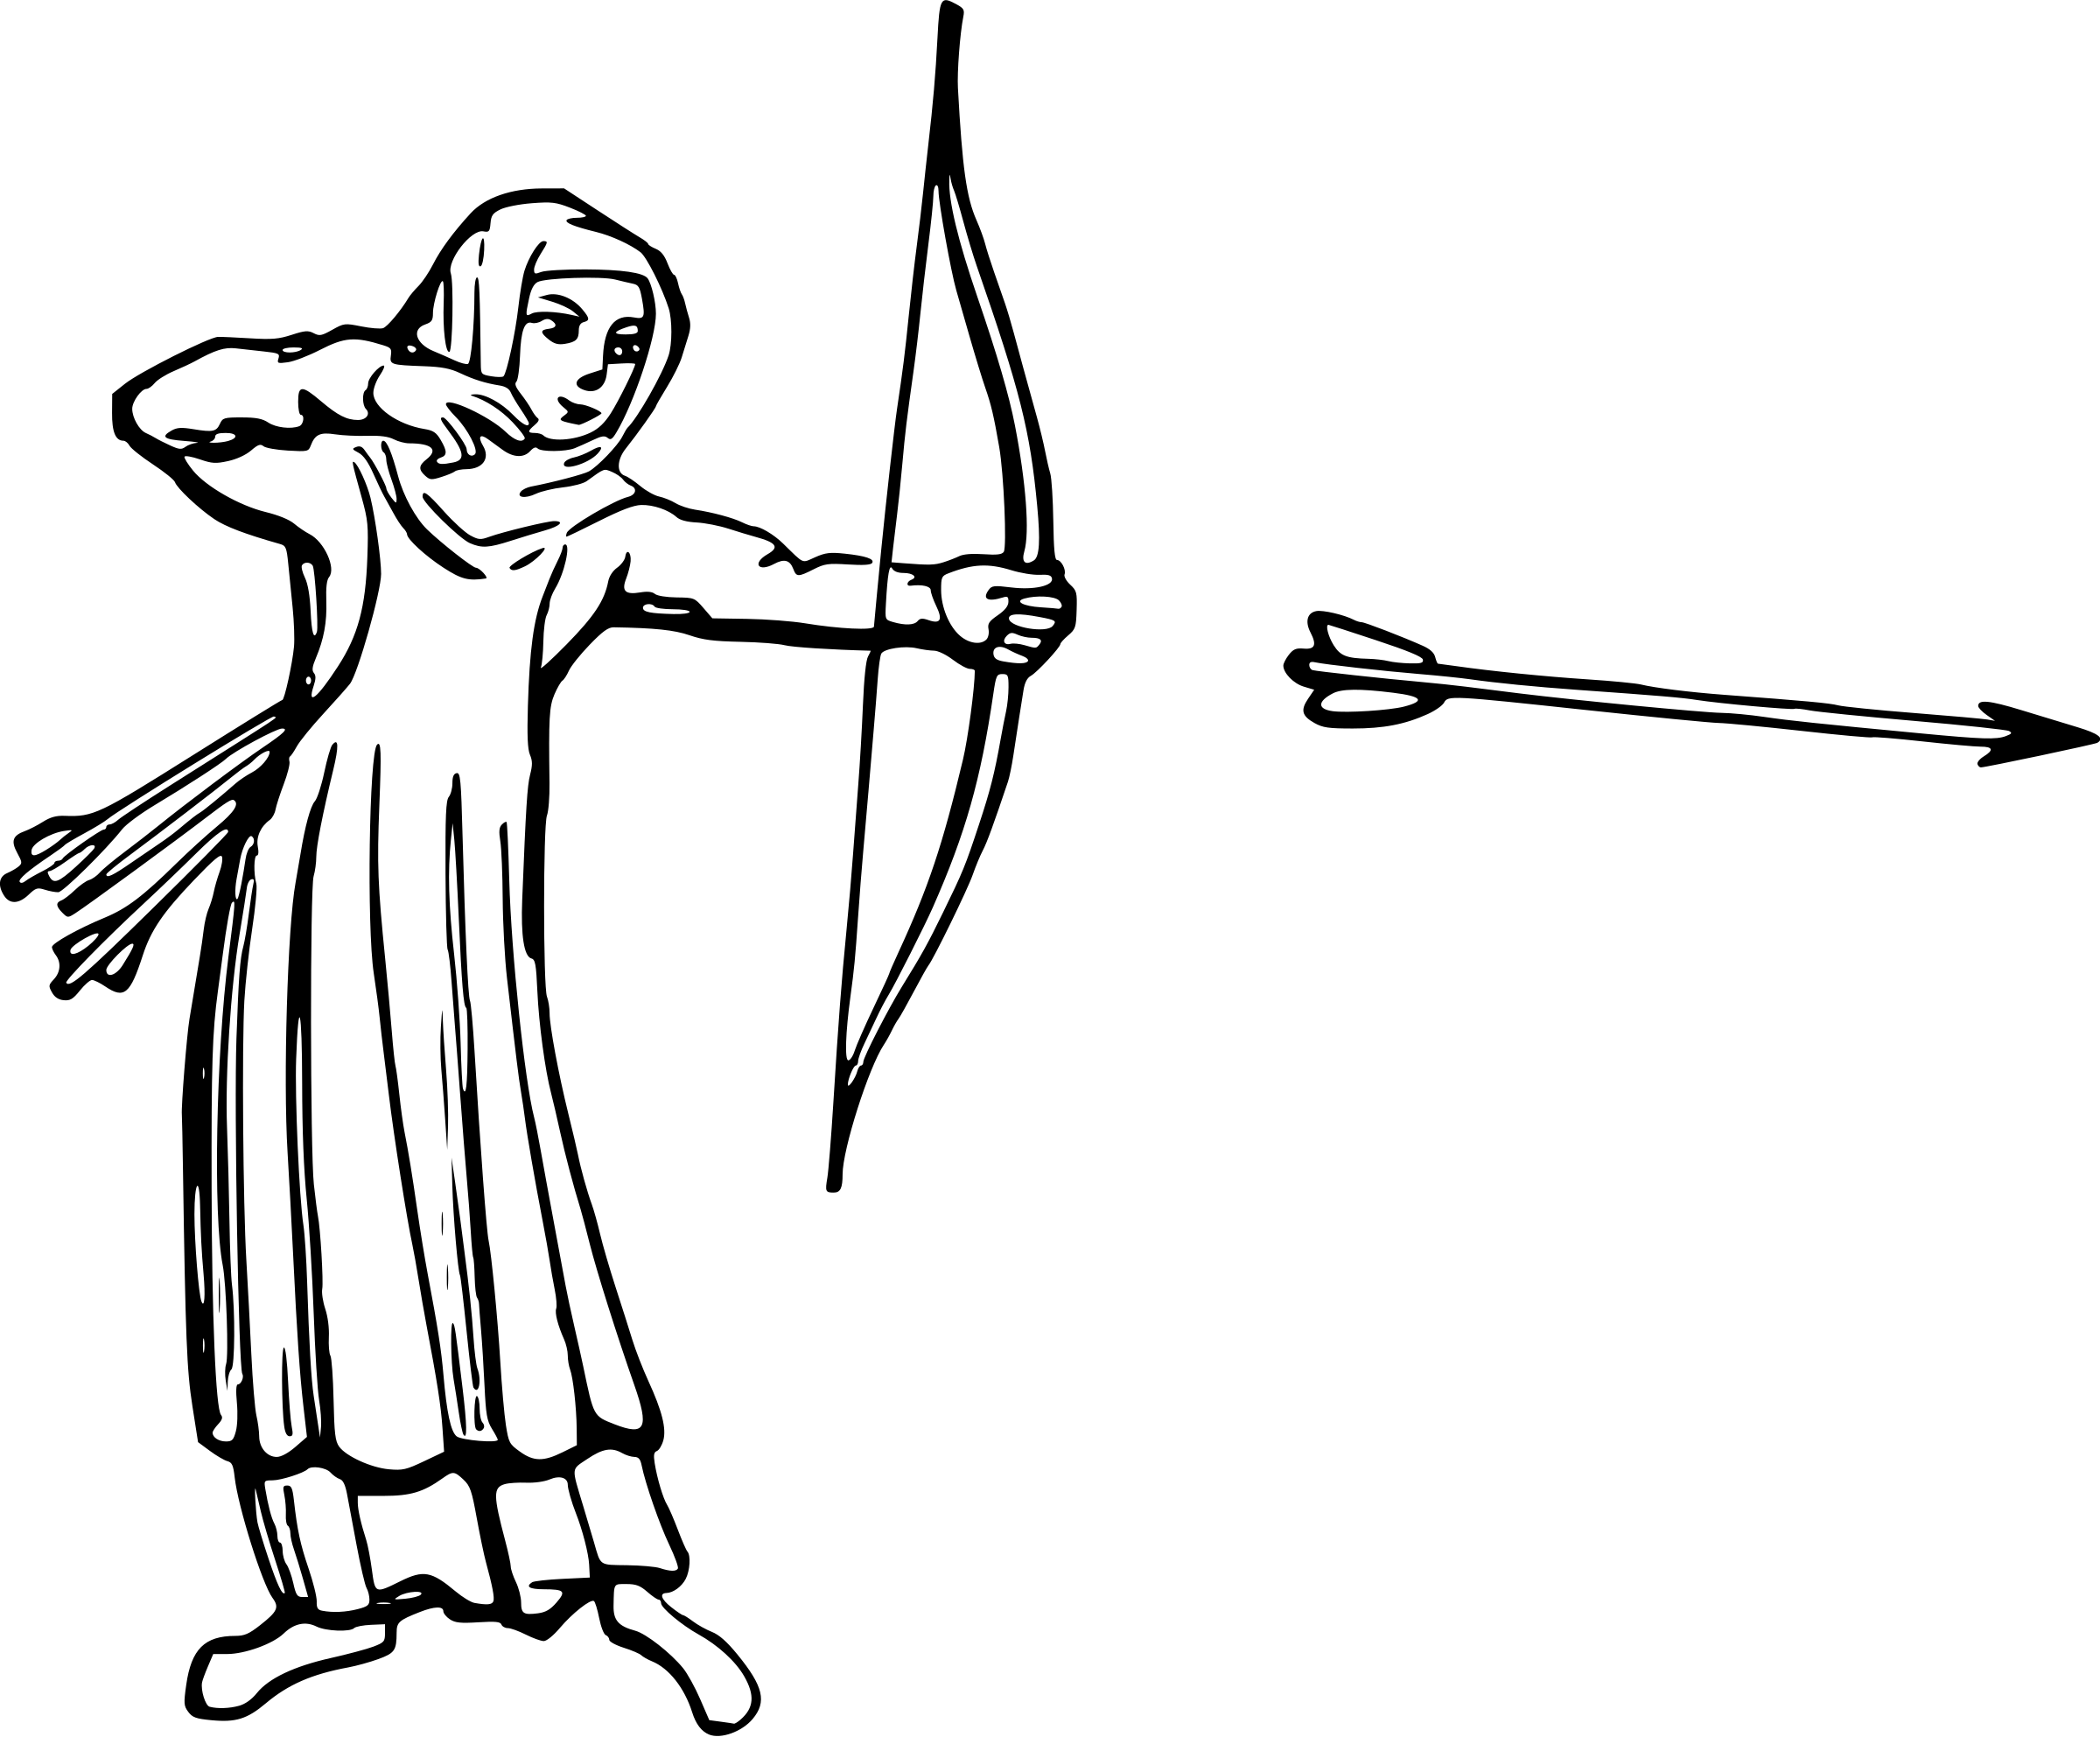 2400x1985 Woman Archer Silhouette. Illustration A Fantasy Woman Archer